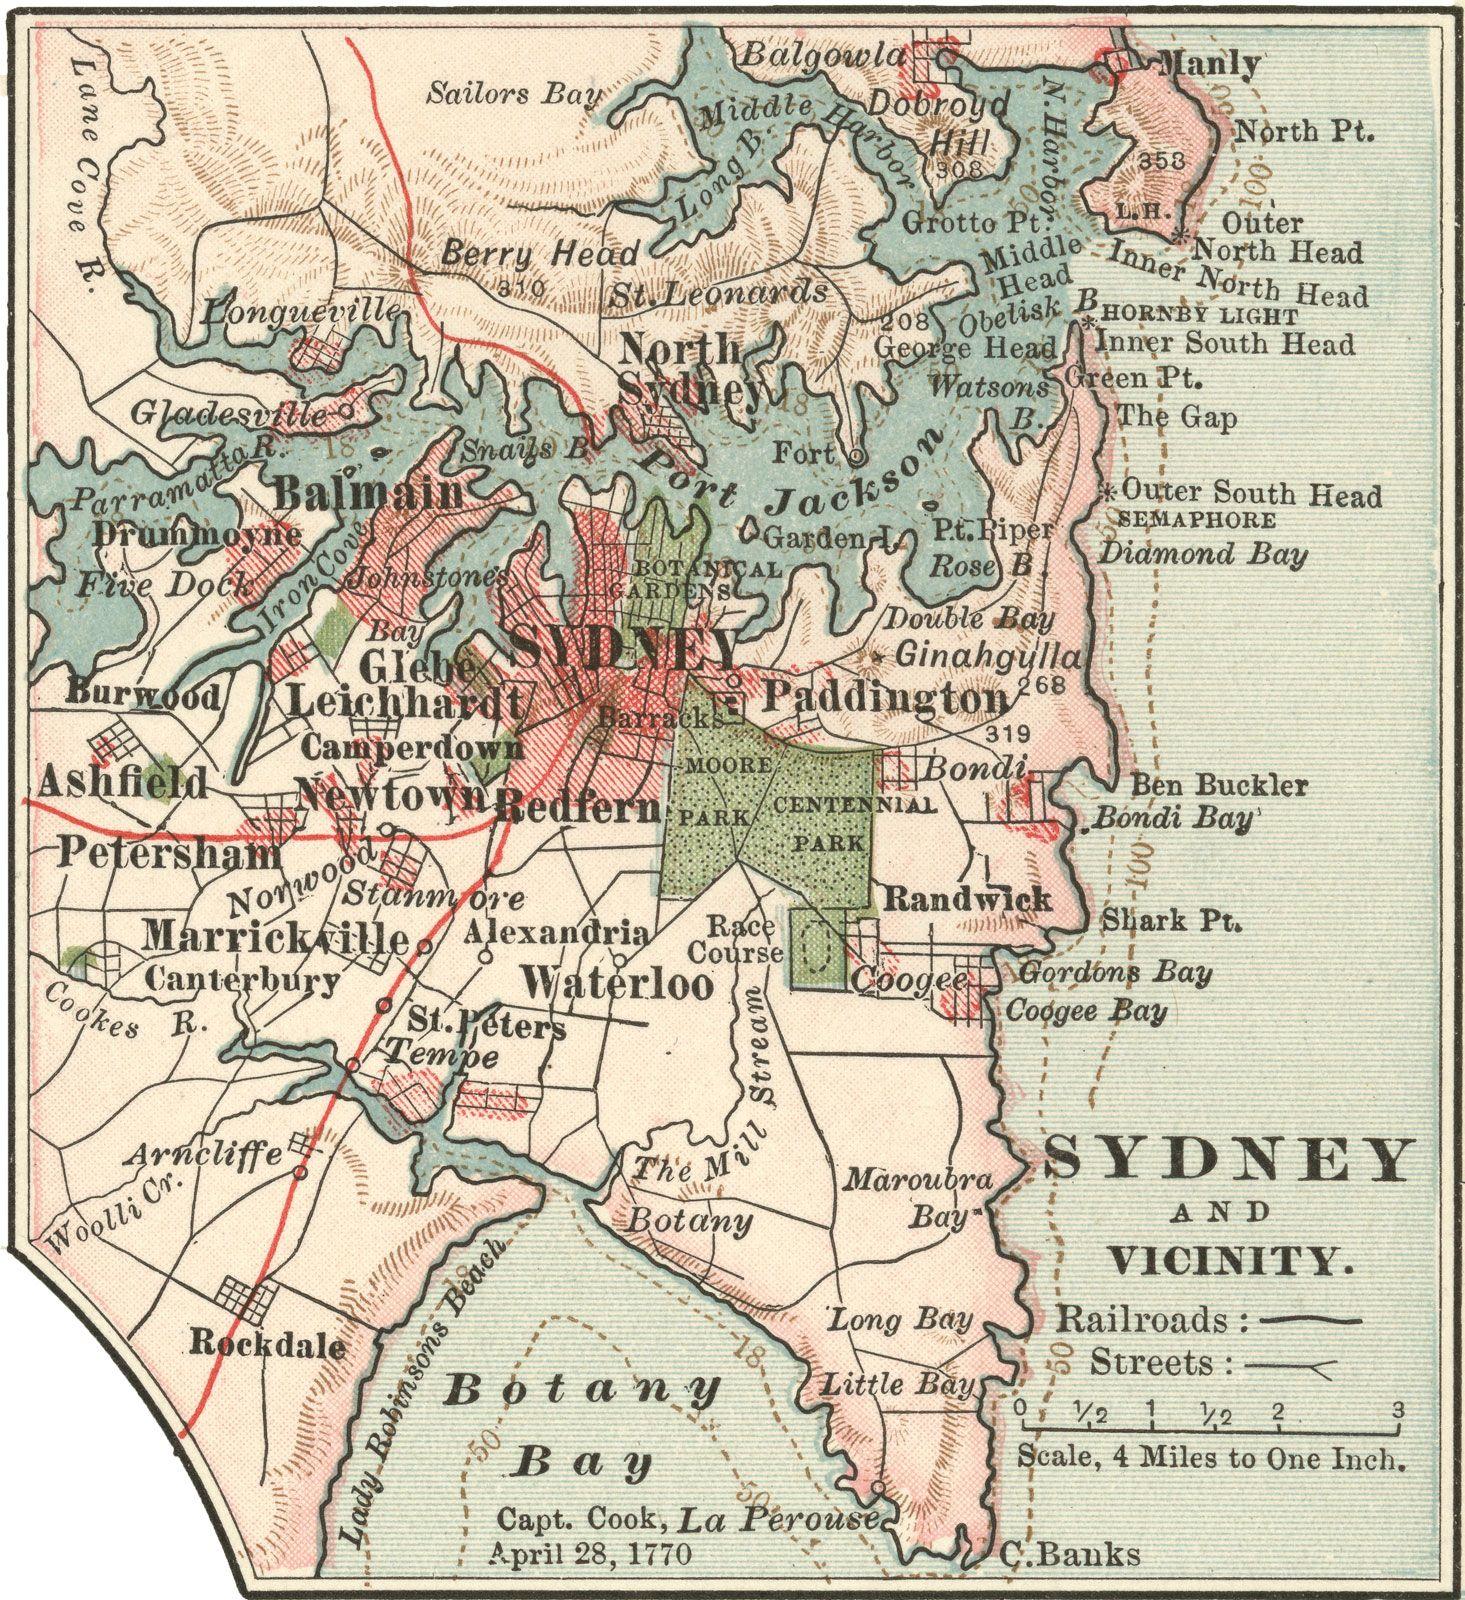 Australia Map 1900.Map Of Sydney 1900 Map Sydney Australia Sydney Map